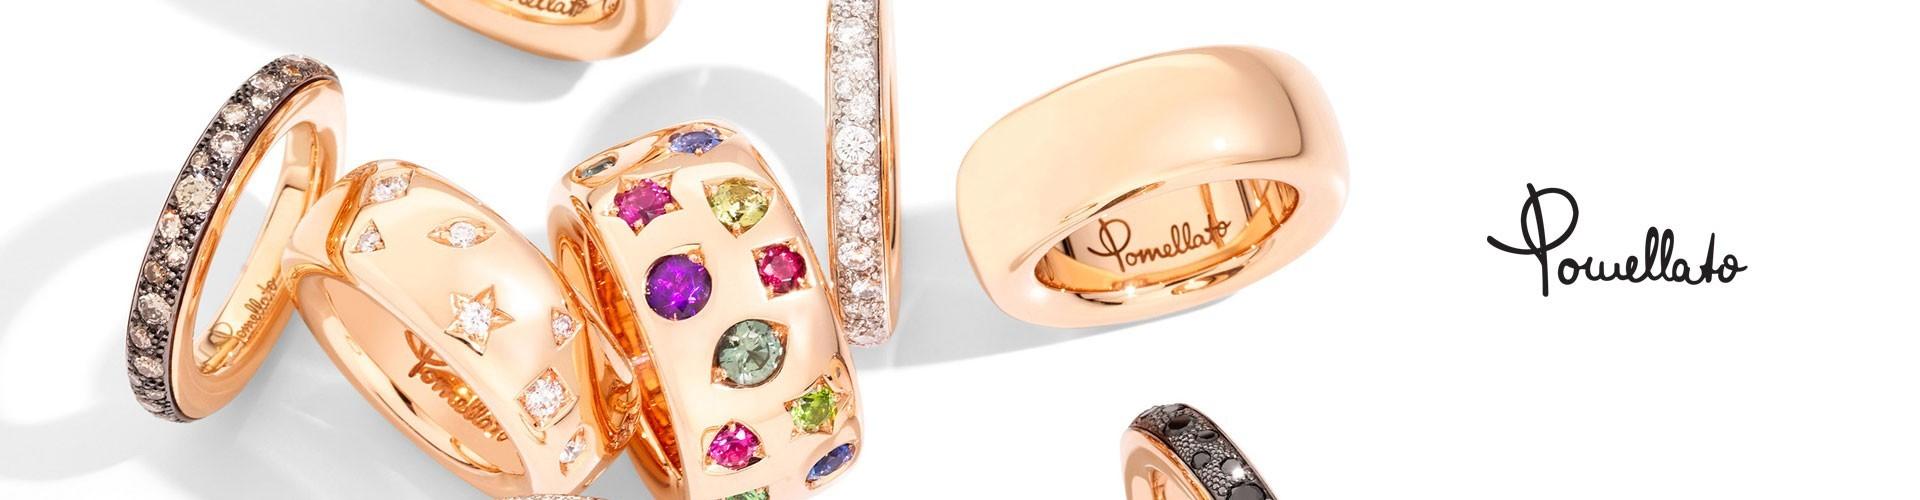 Pomellato joaillerie : Explorez les collections Pomellato chez Ben Jannet